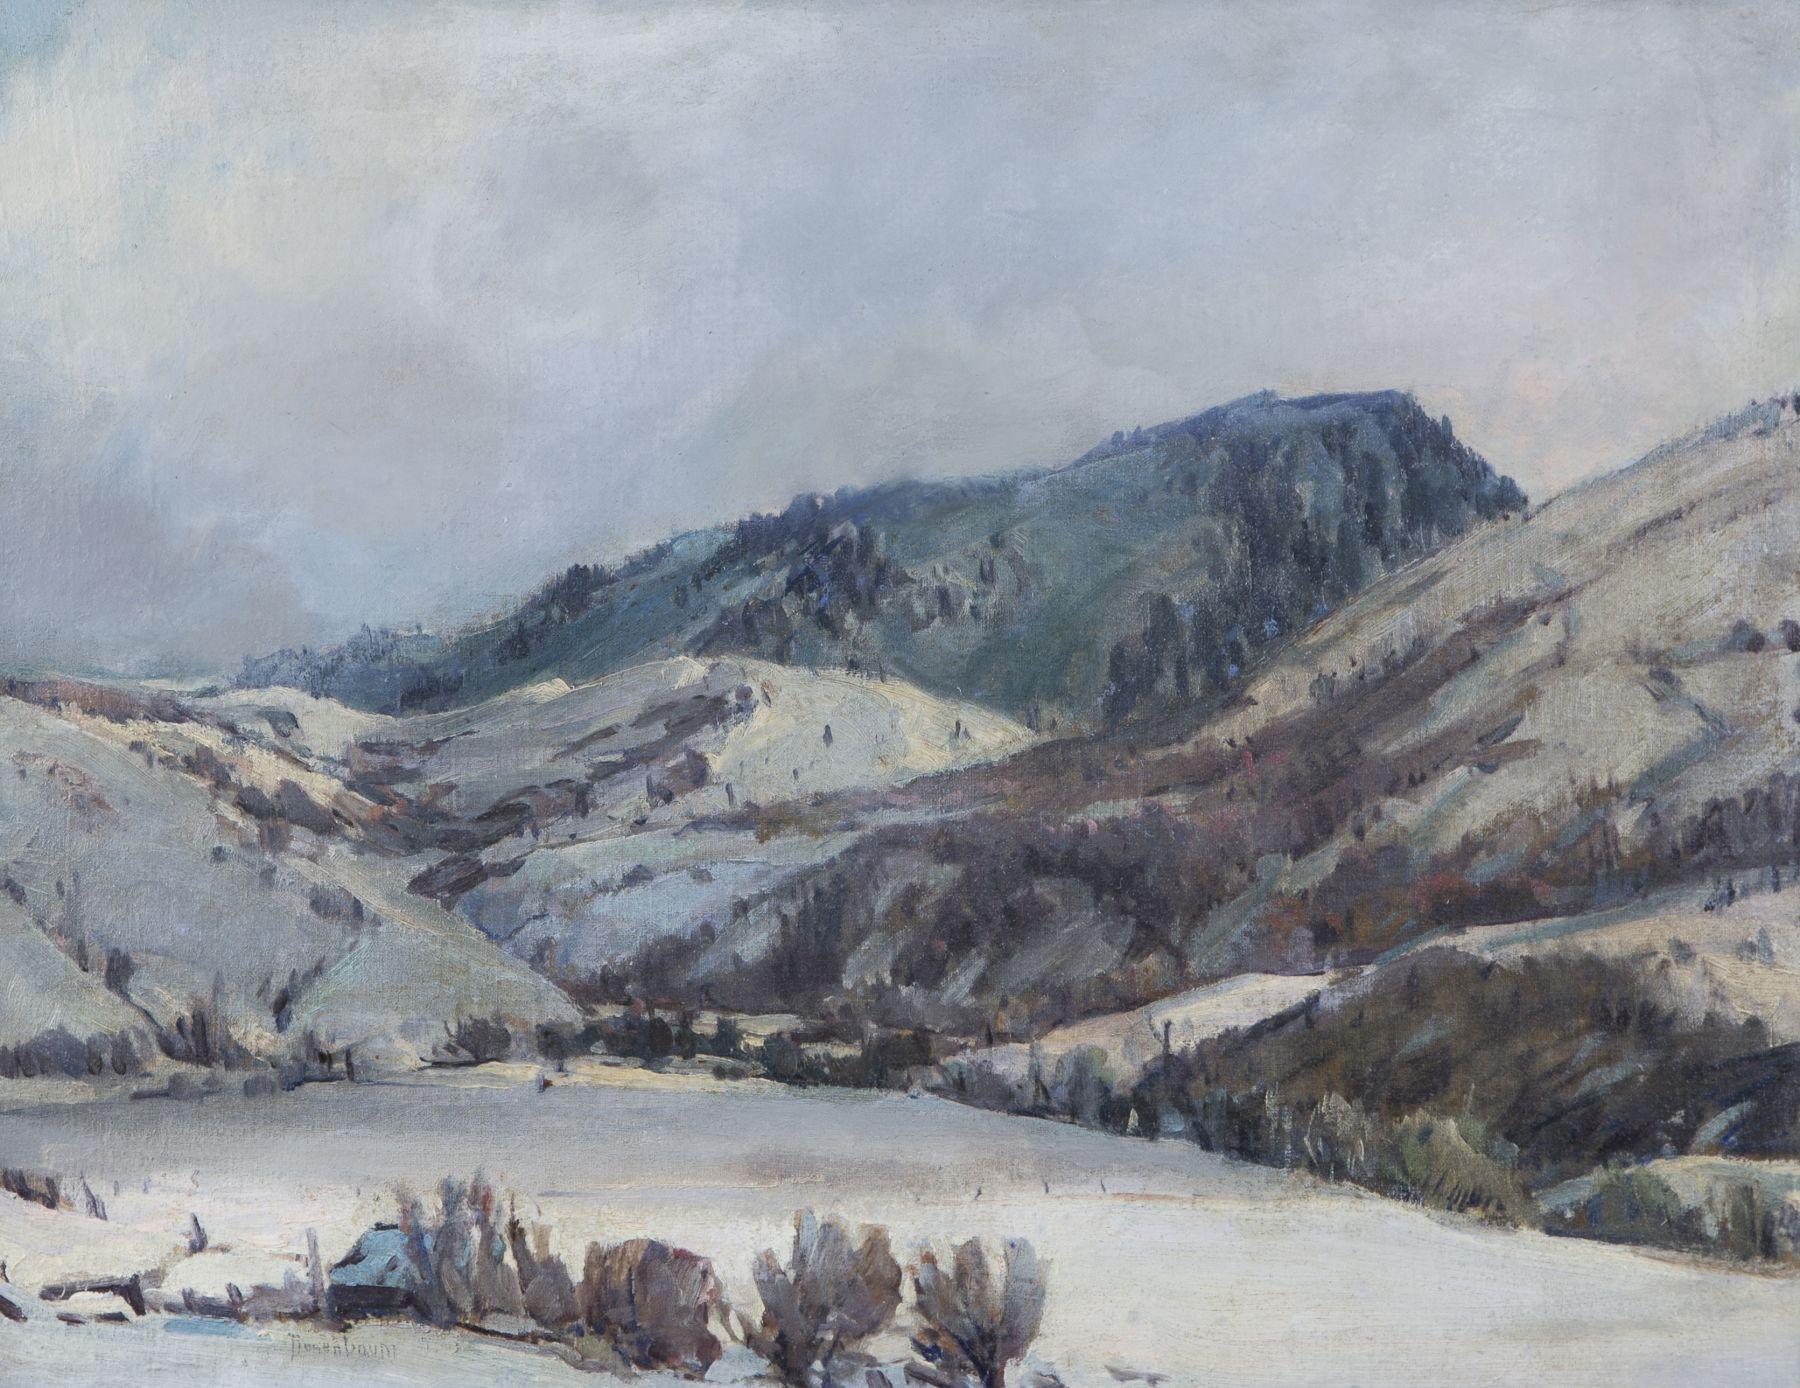 Rosenbaum, utah artist, western landscape